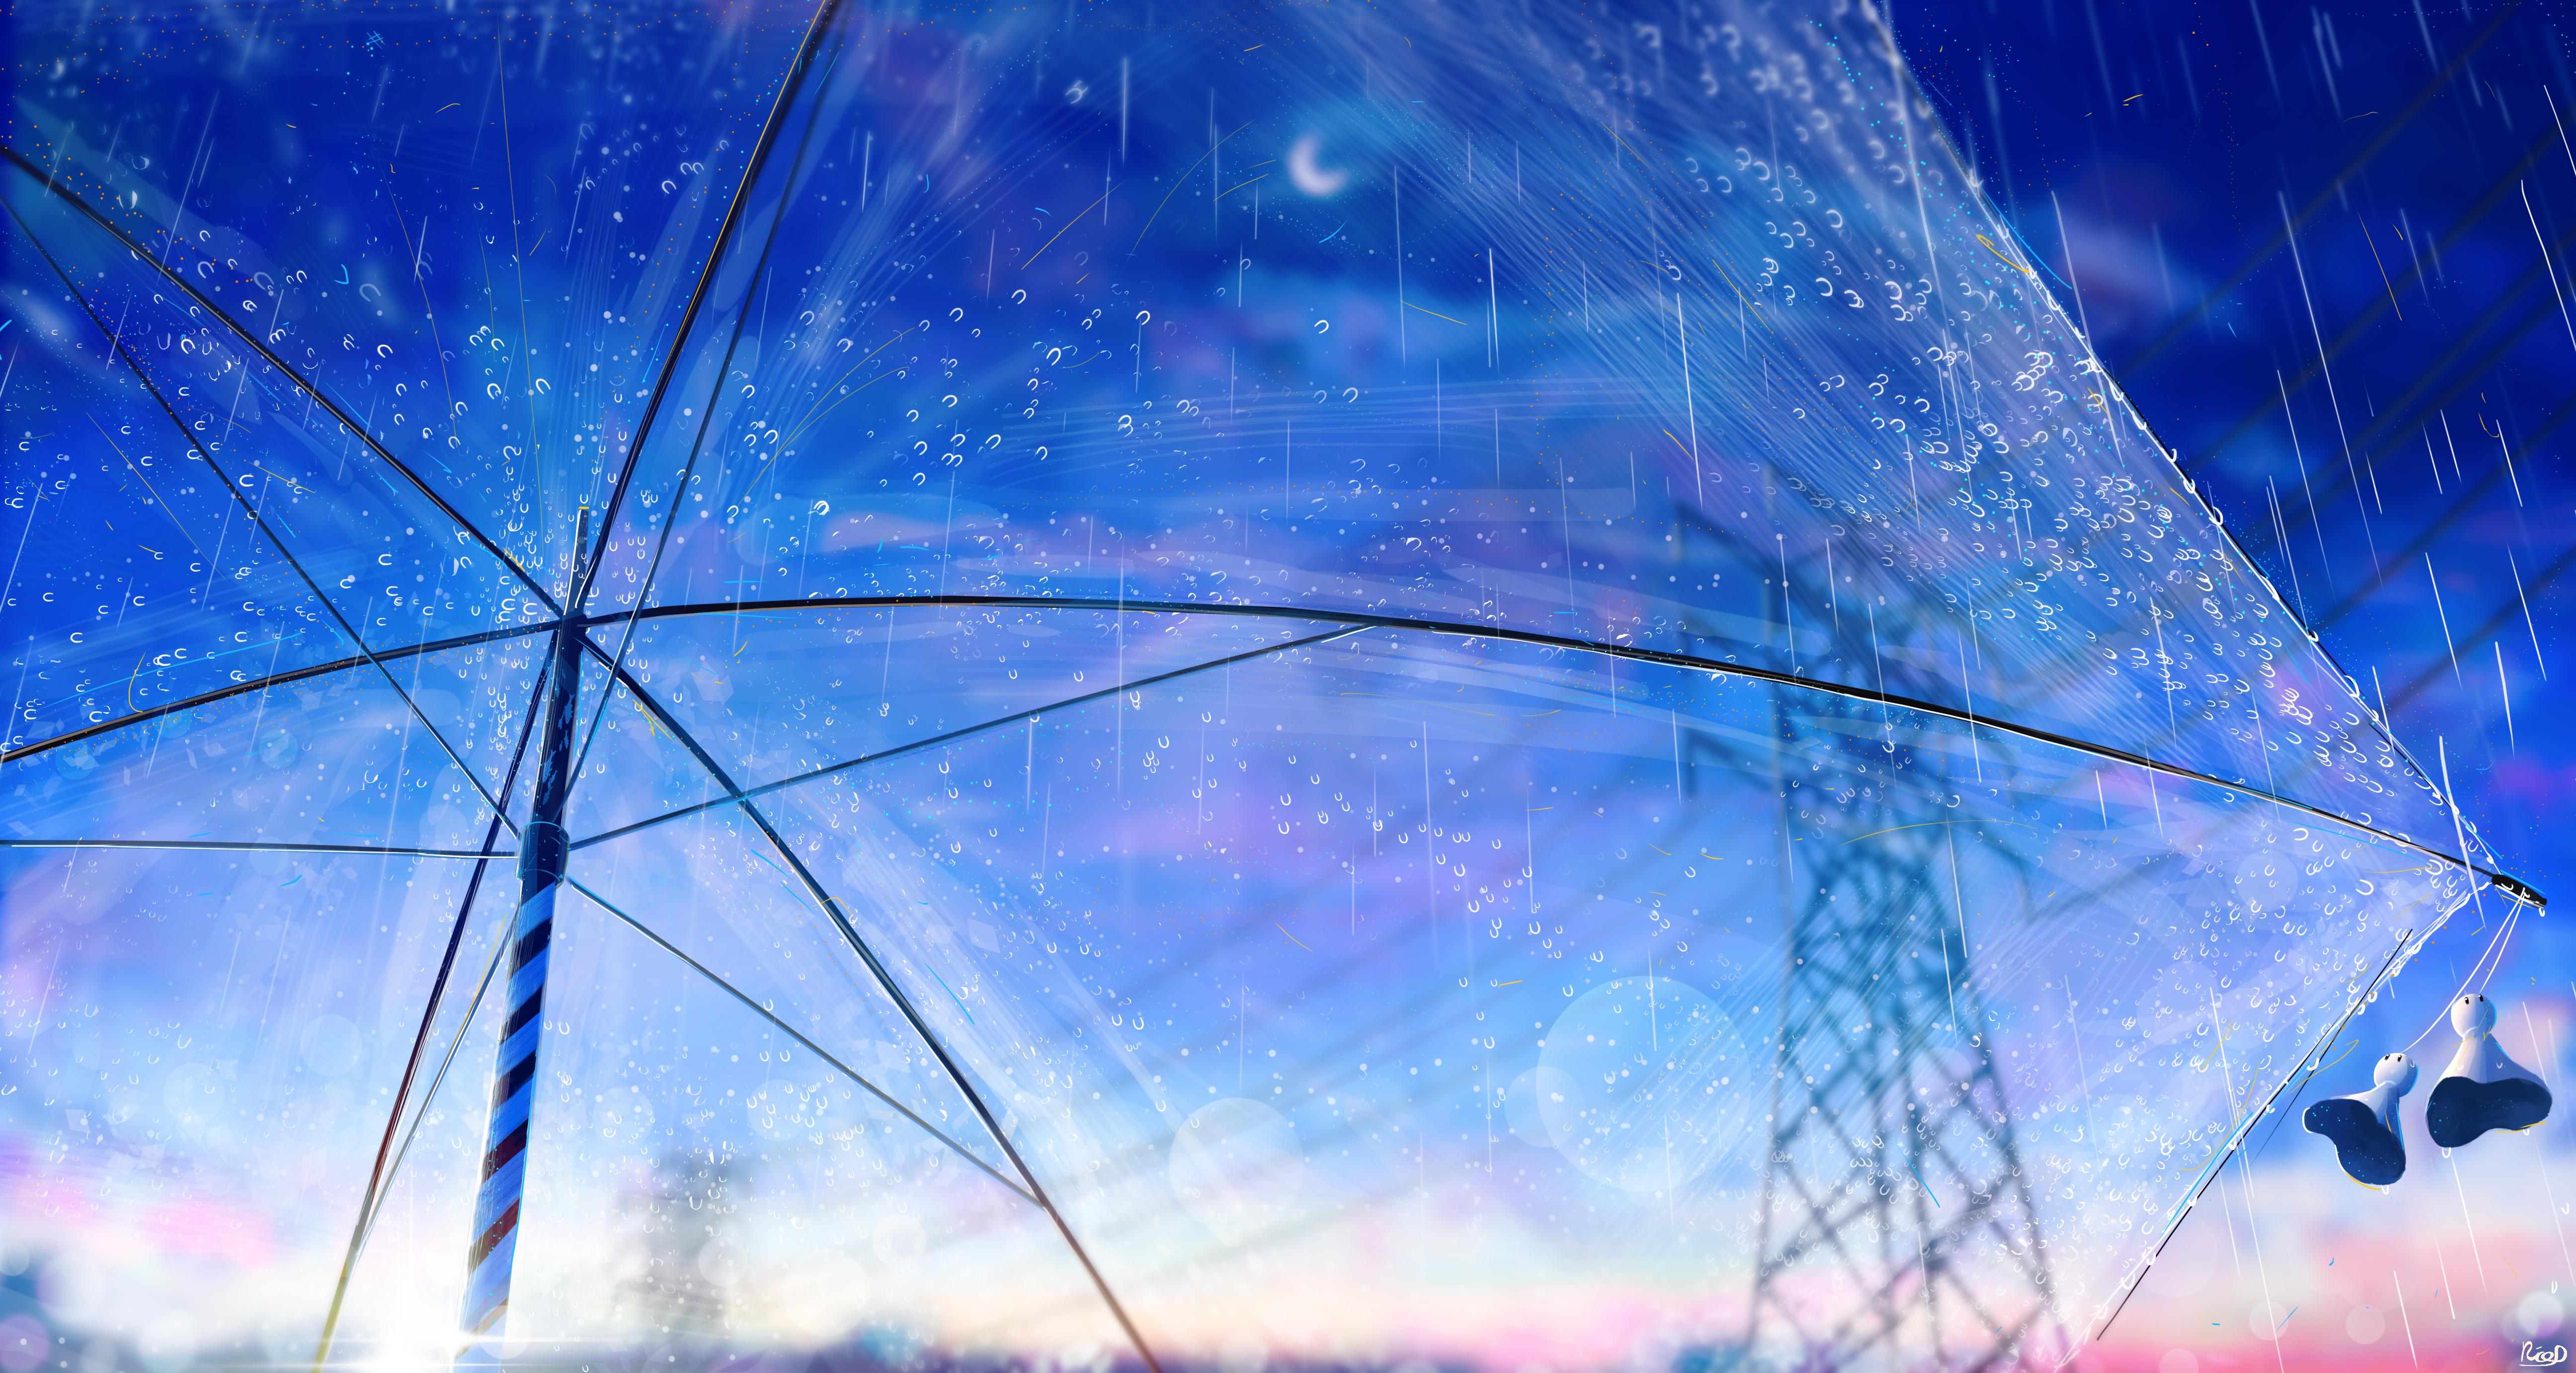 General 5182x2762 RicoDZ umbrella rain ghost Moon bokeh power lines